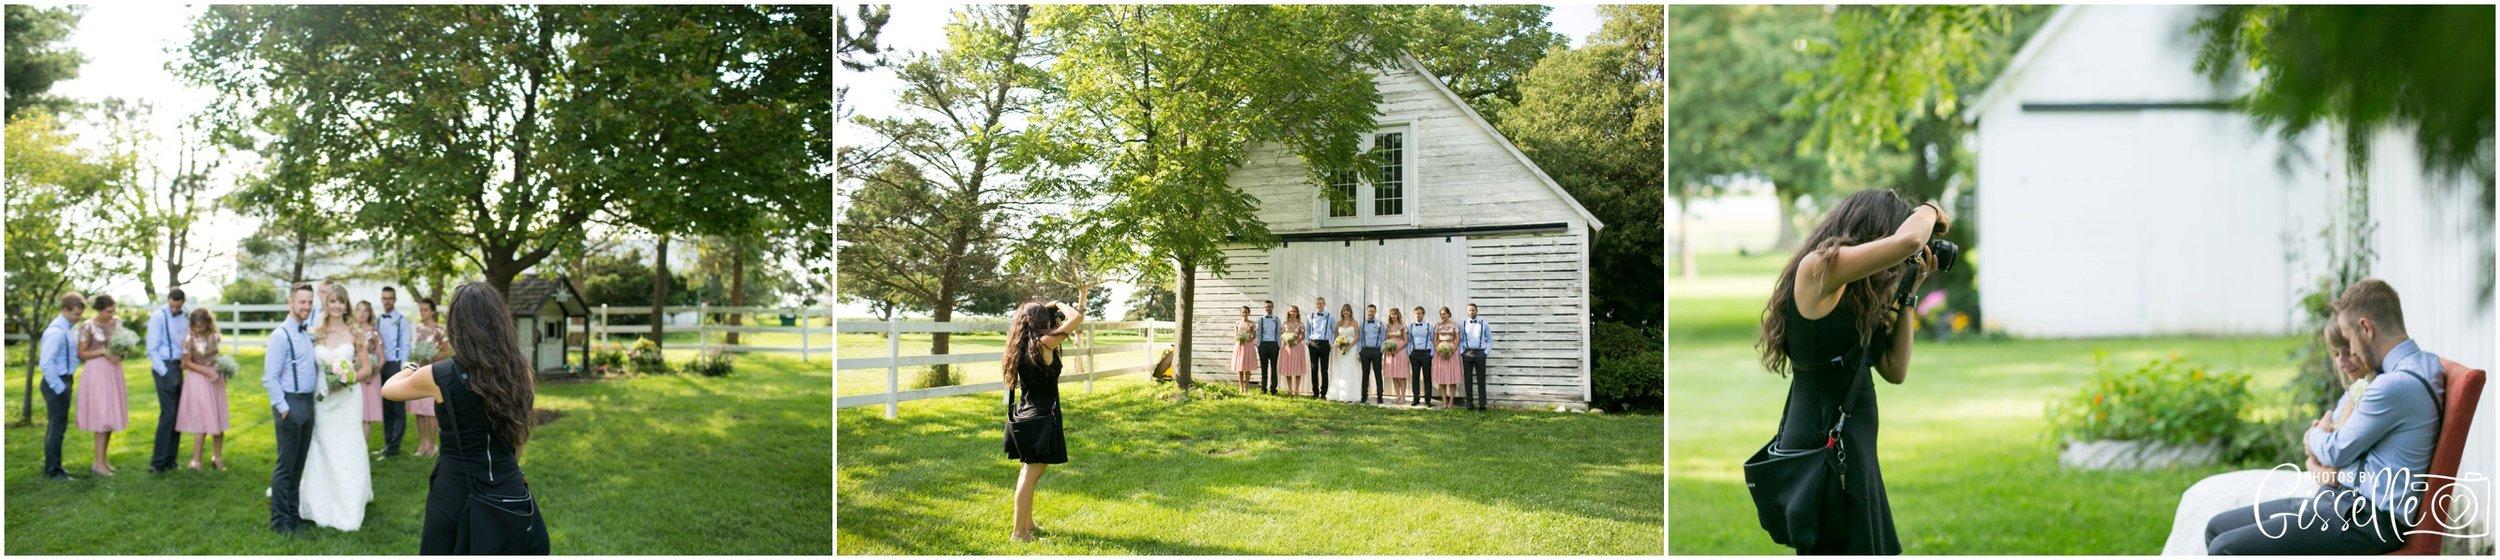 Northfork Farm Wedding_0428.jpg